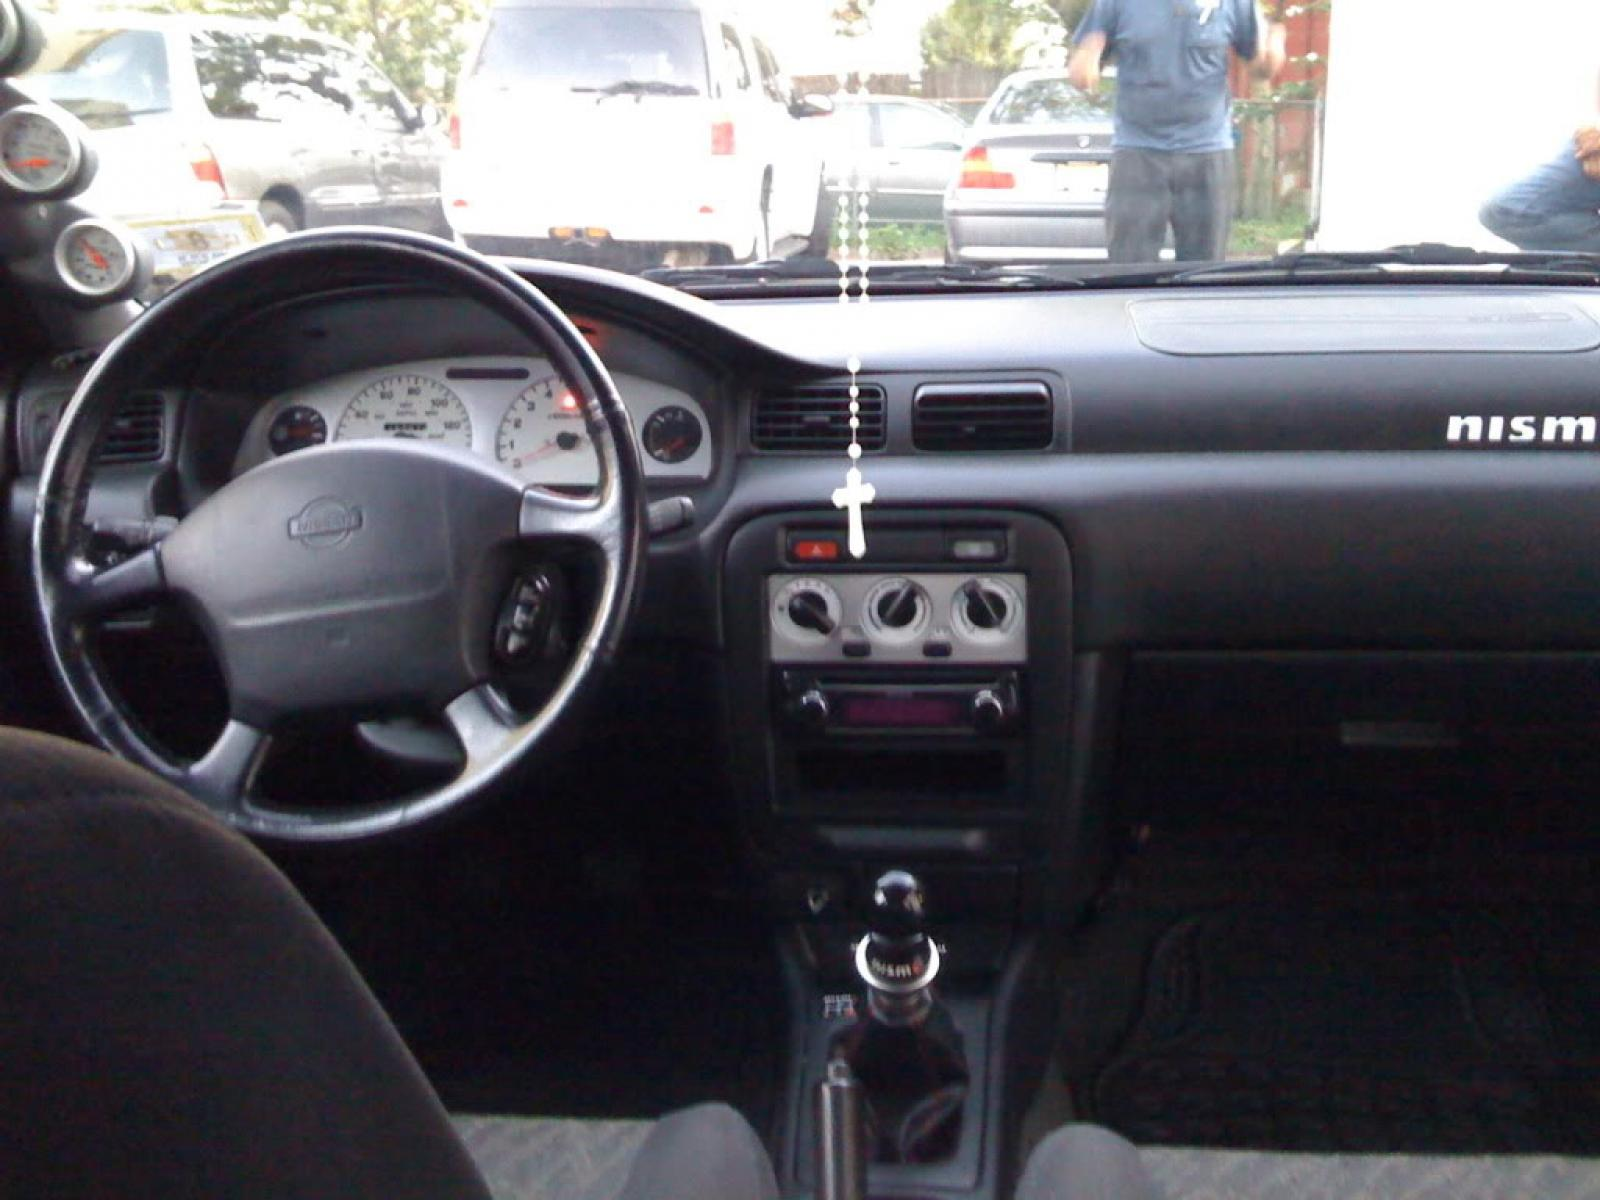 1998 Nissan Sentra Information And Photos Zombiedrive B12 Fuse Box 800 1024 1280 1600 Origin